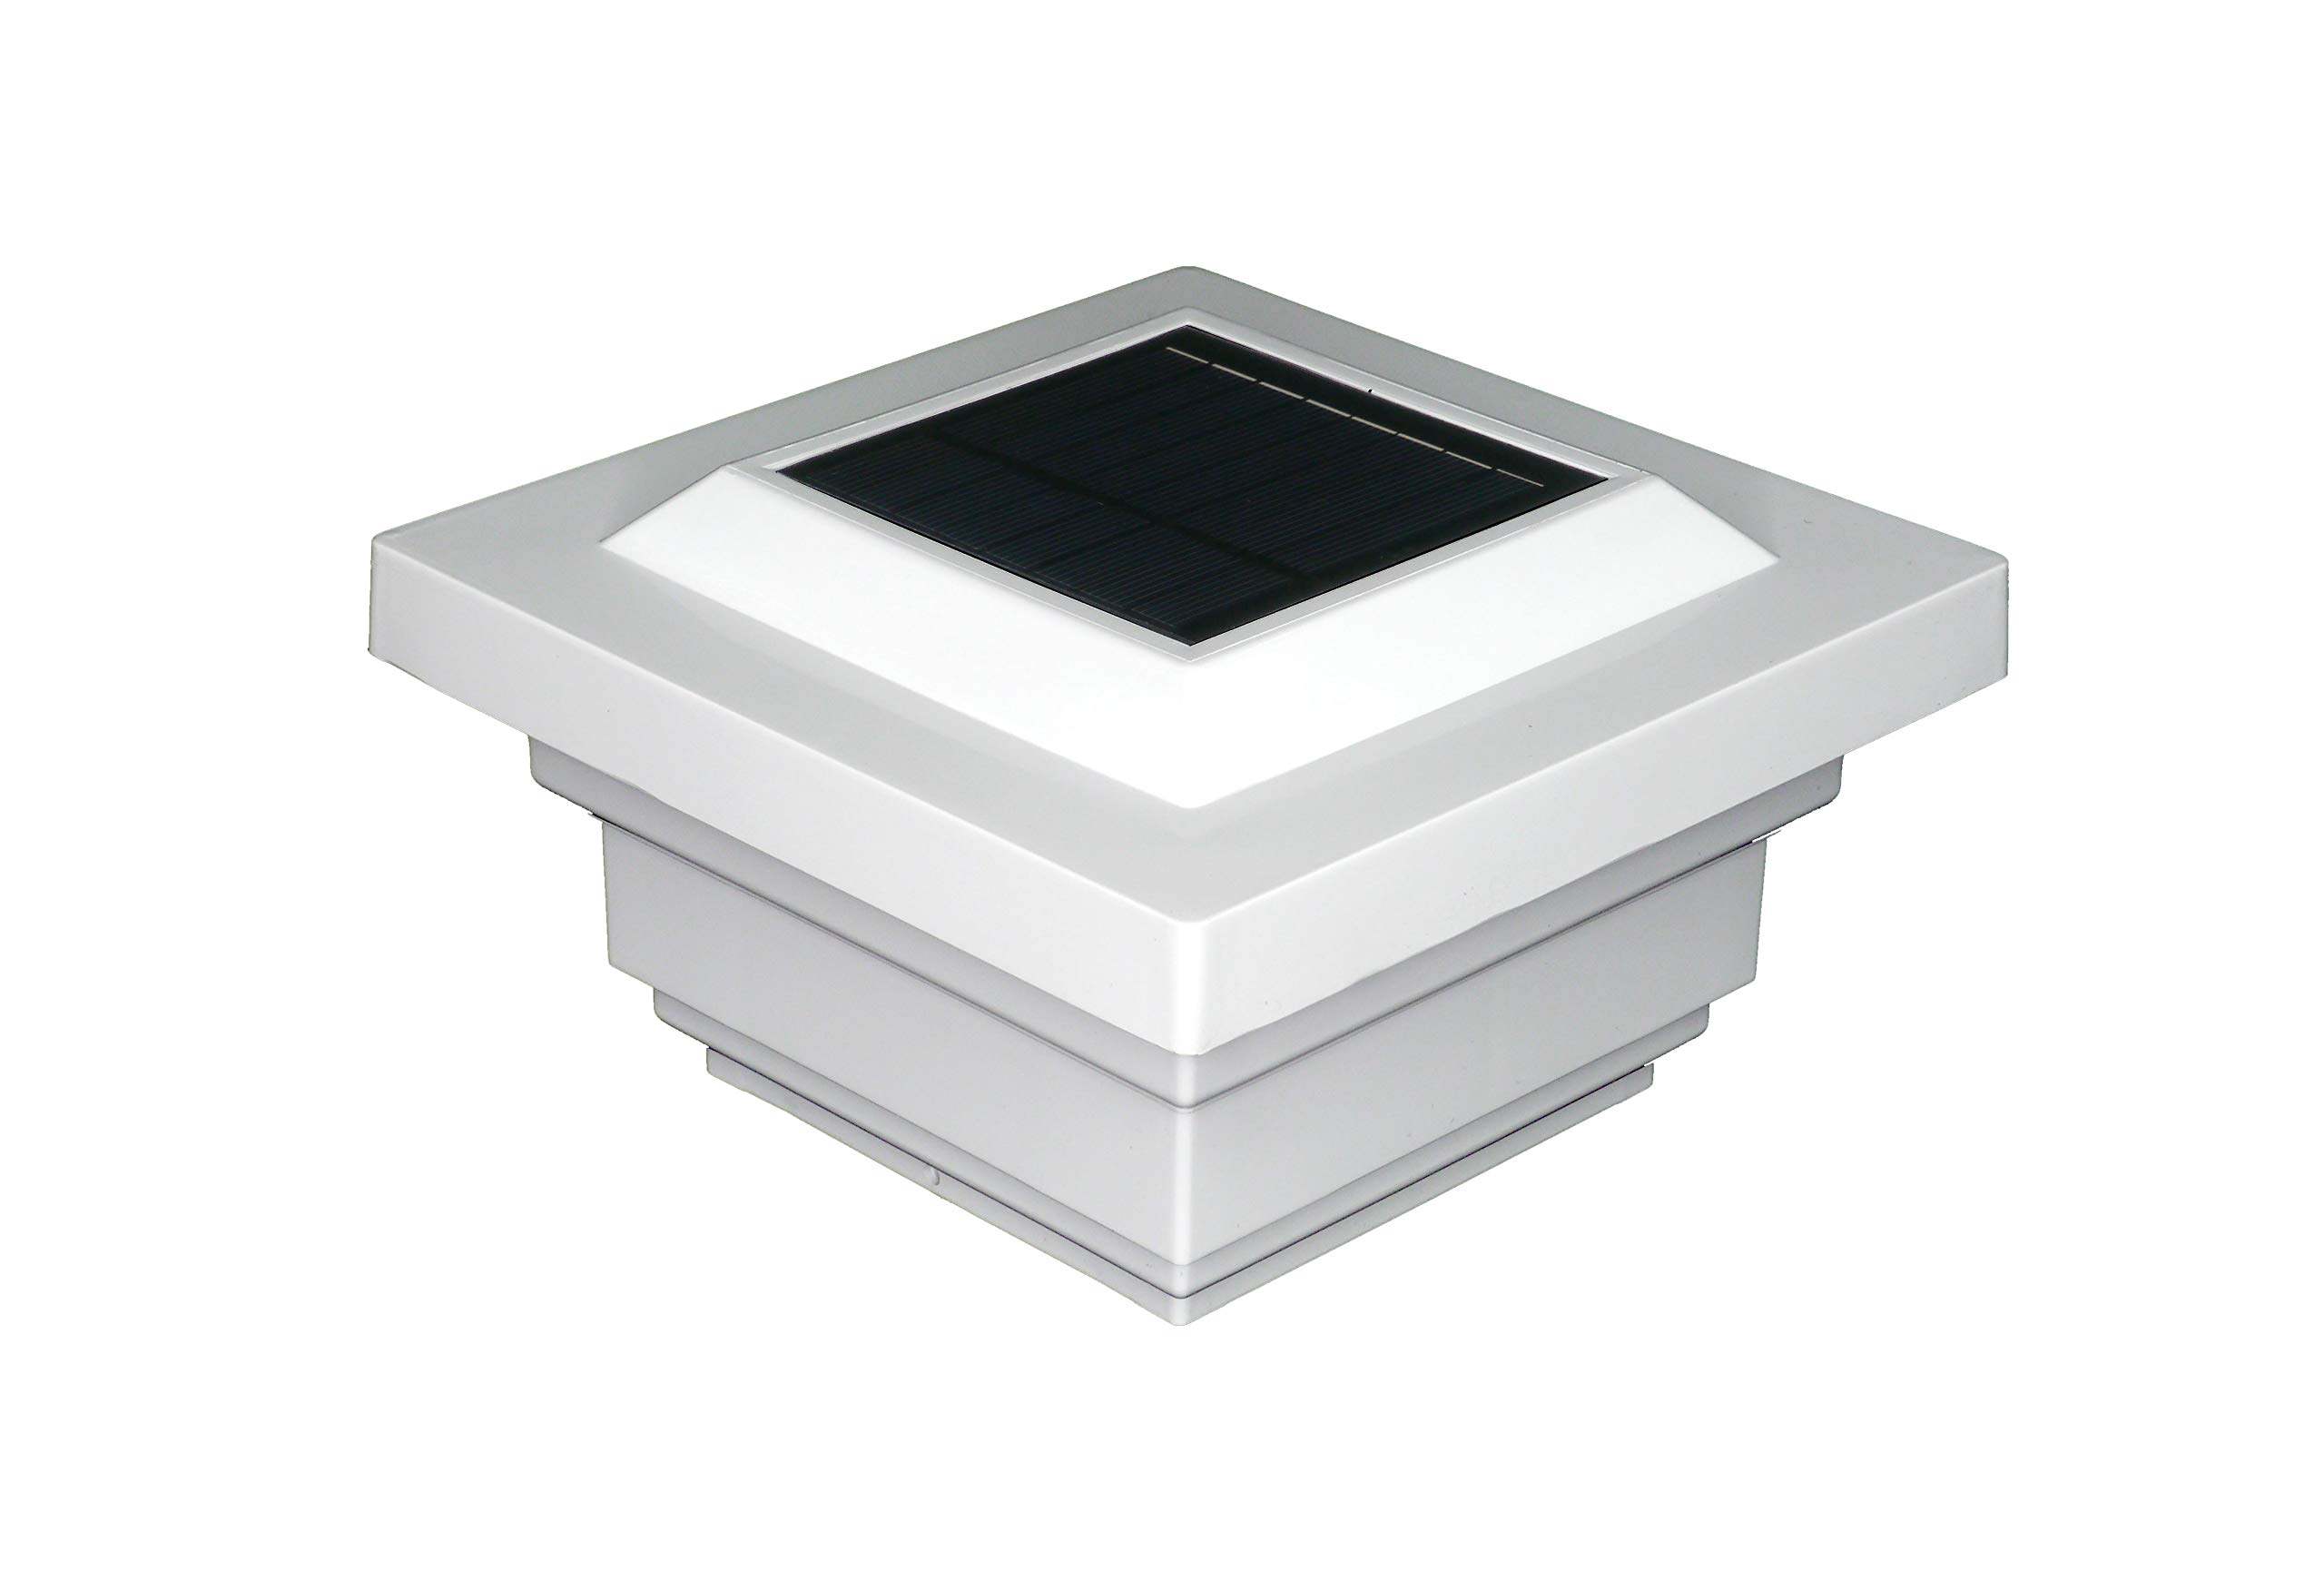 Classy Caps SL078W Regal PVC Solar Post Cap, 4'' x 4'', White by Classy Caps